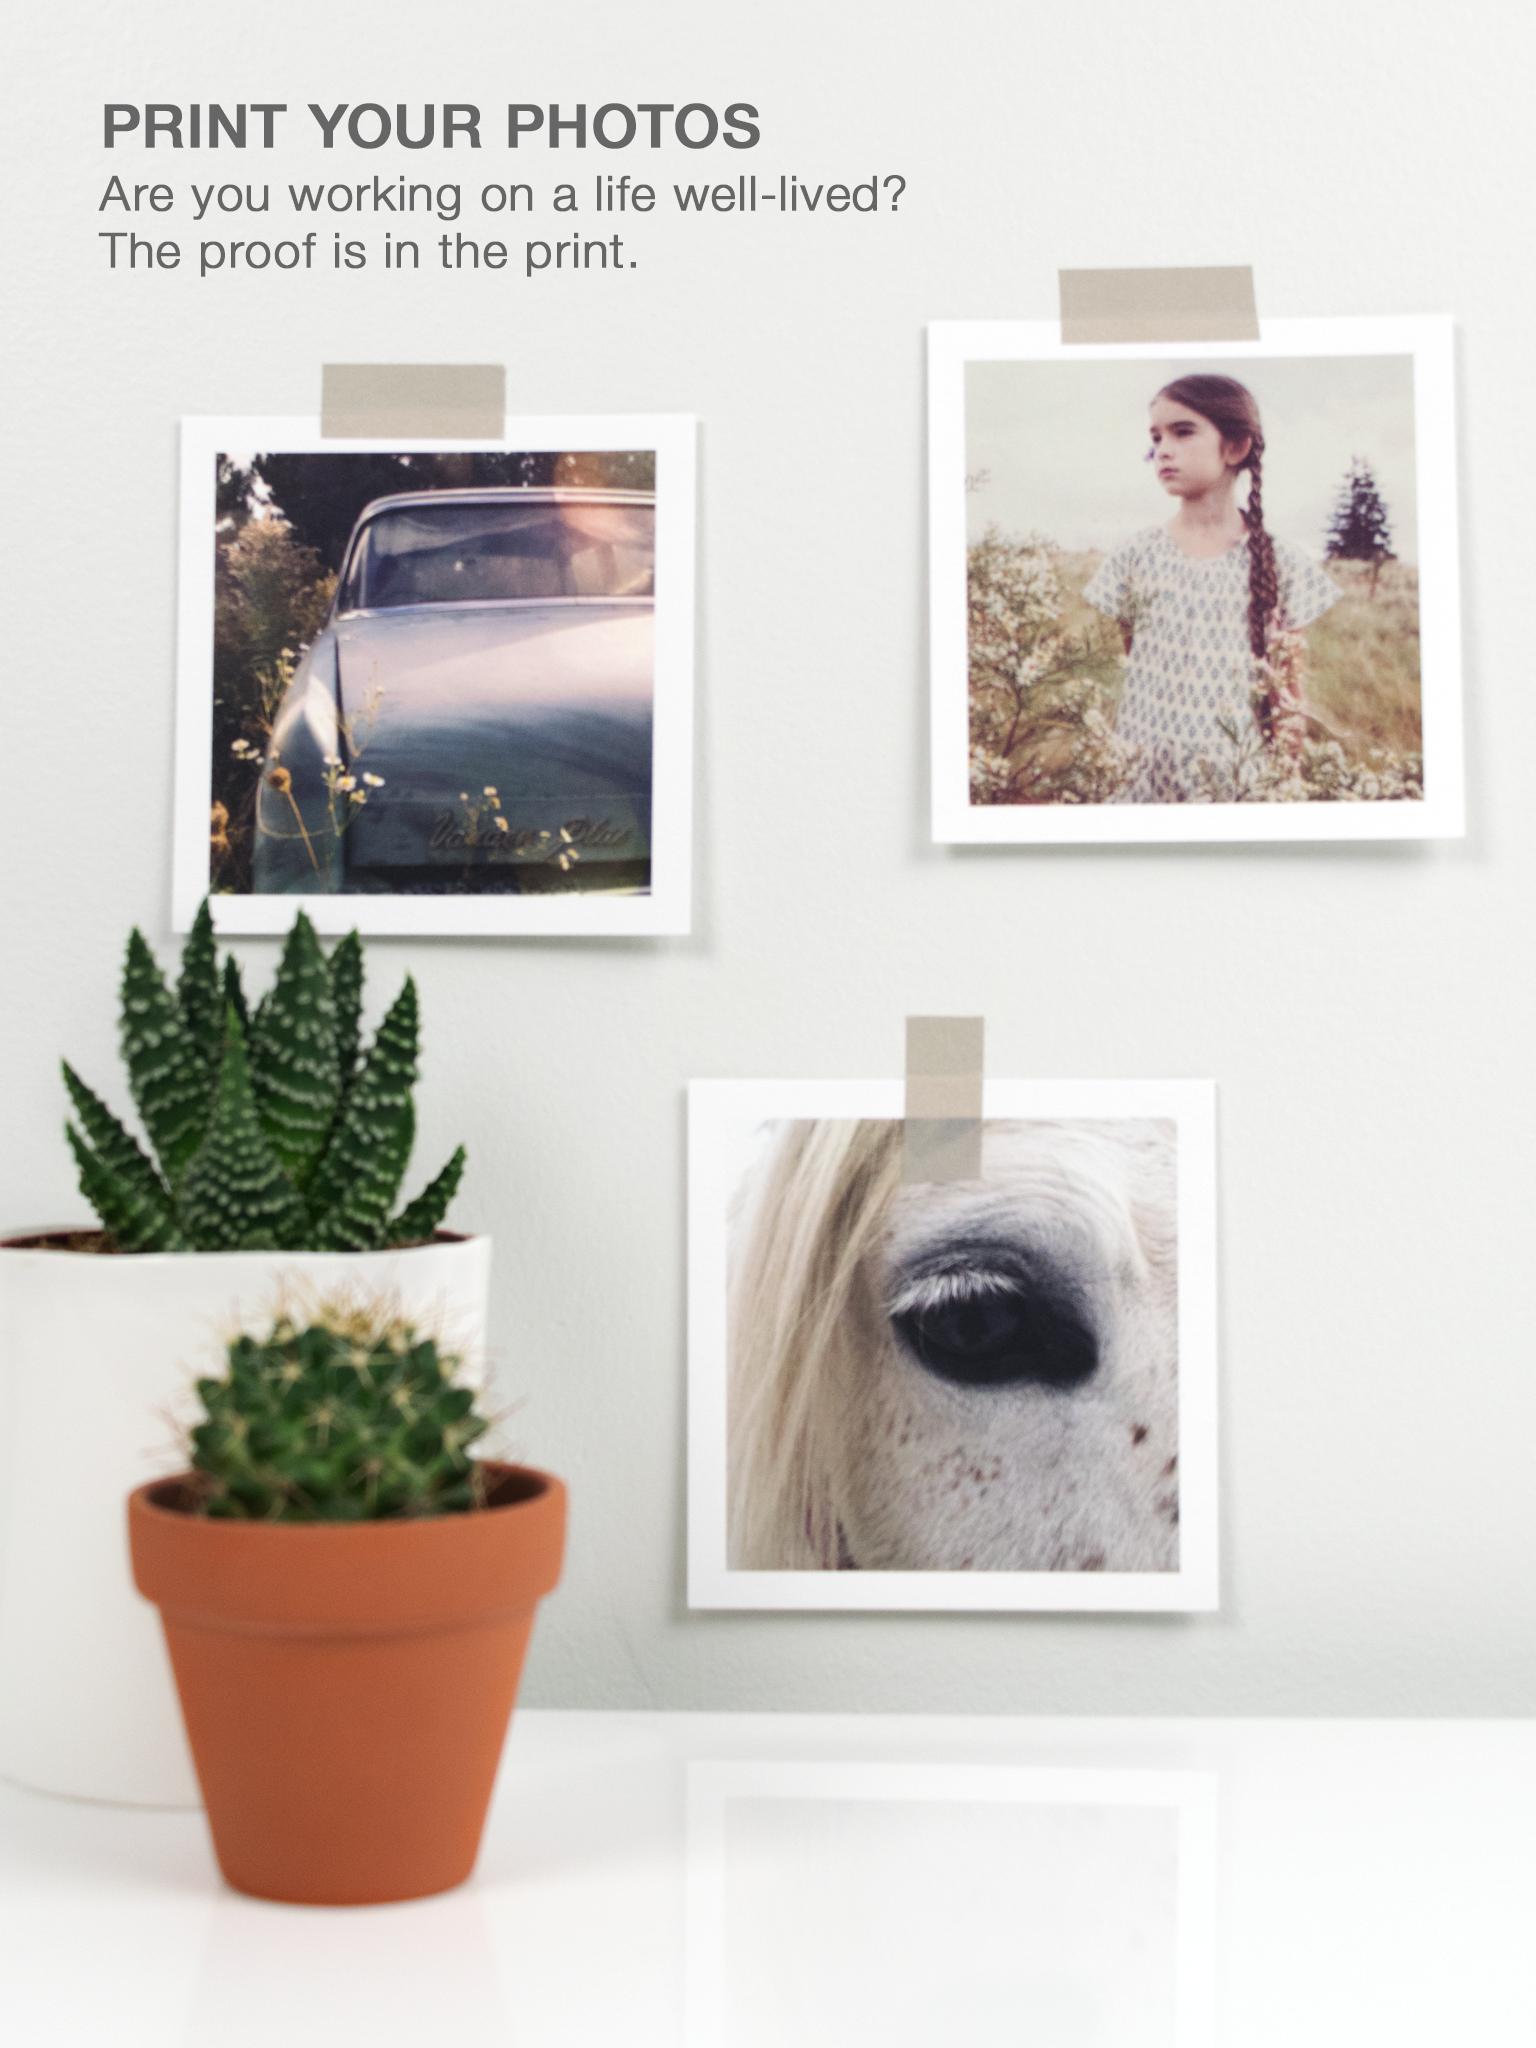 Impressed - Print Your Photos screenshot #6